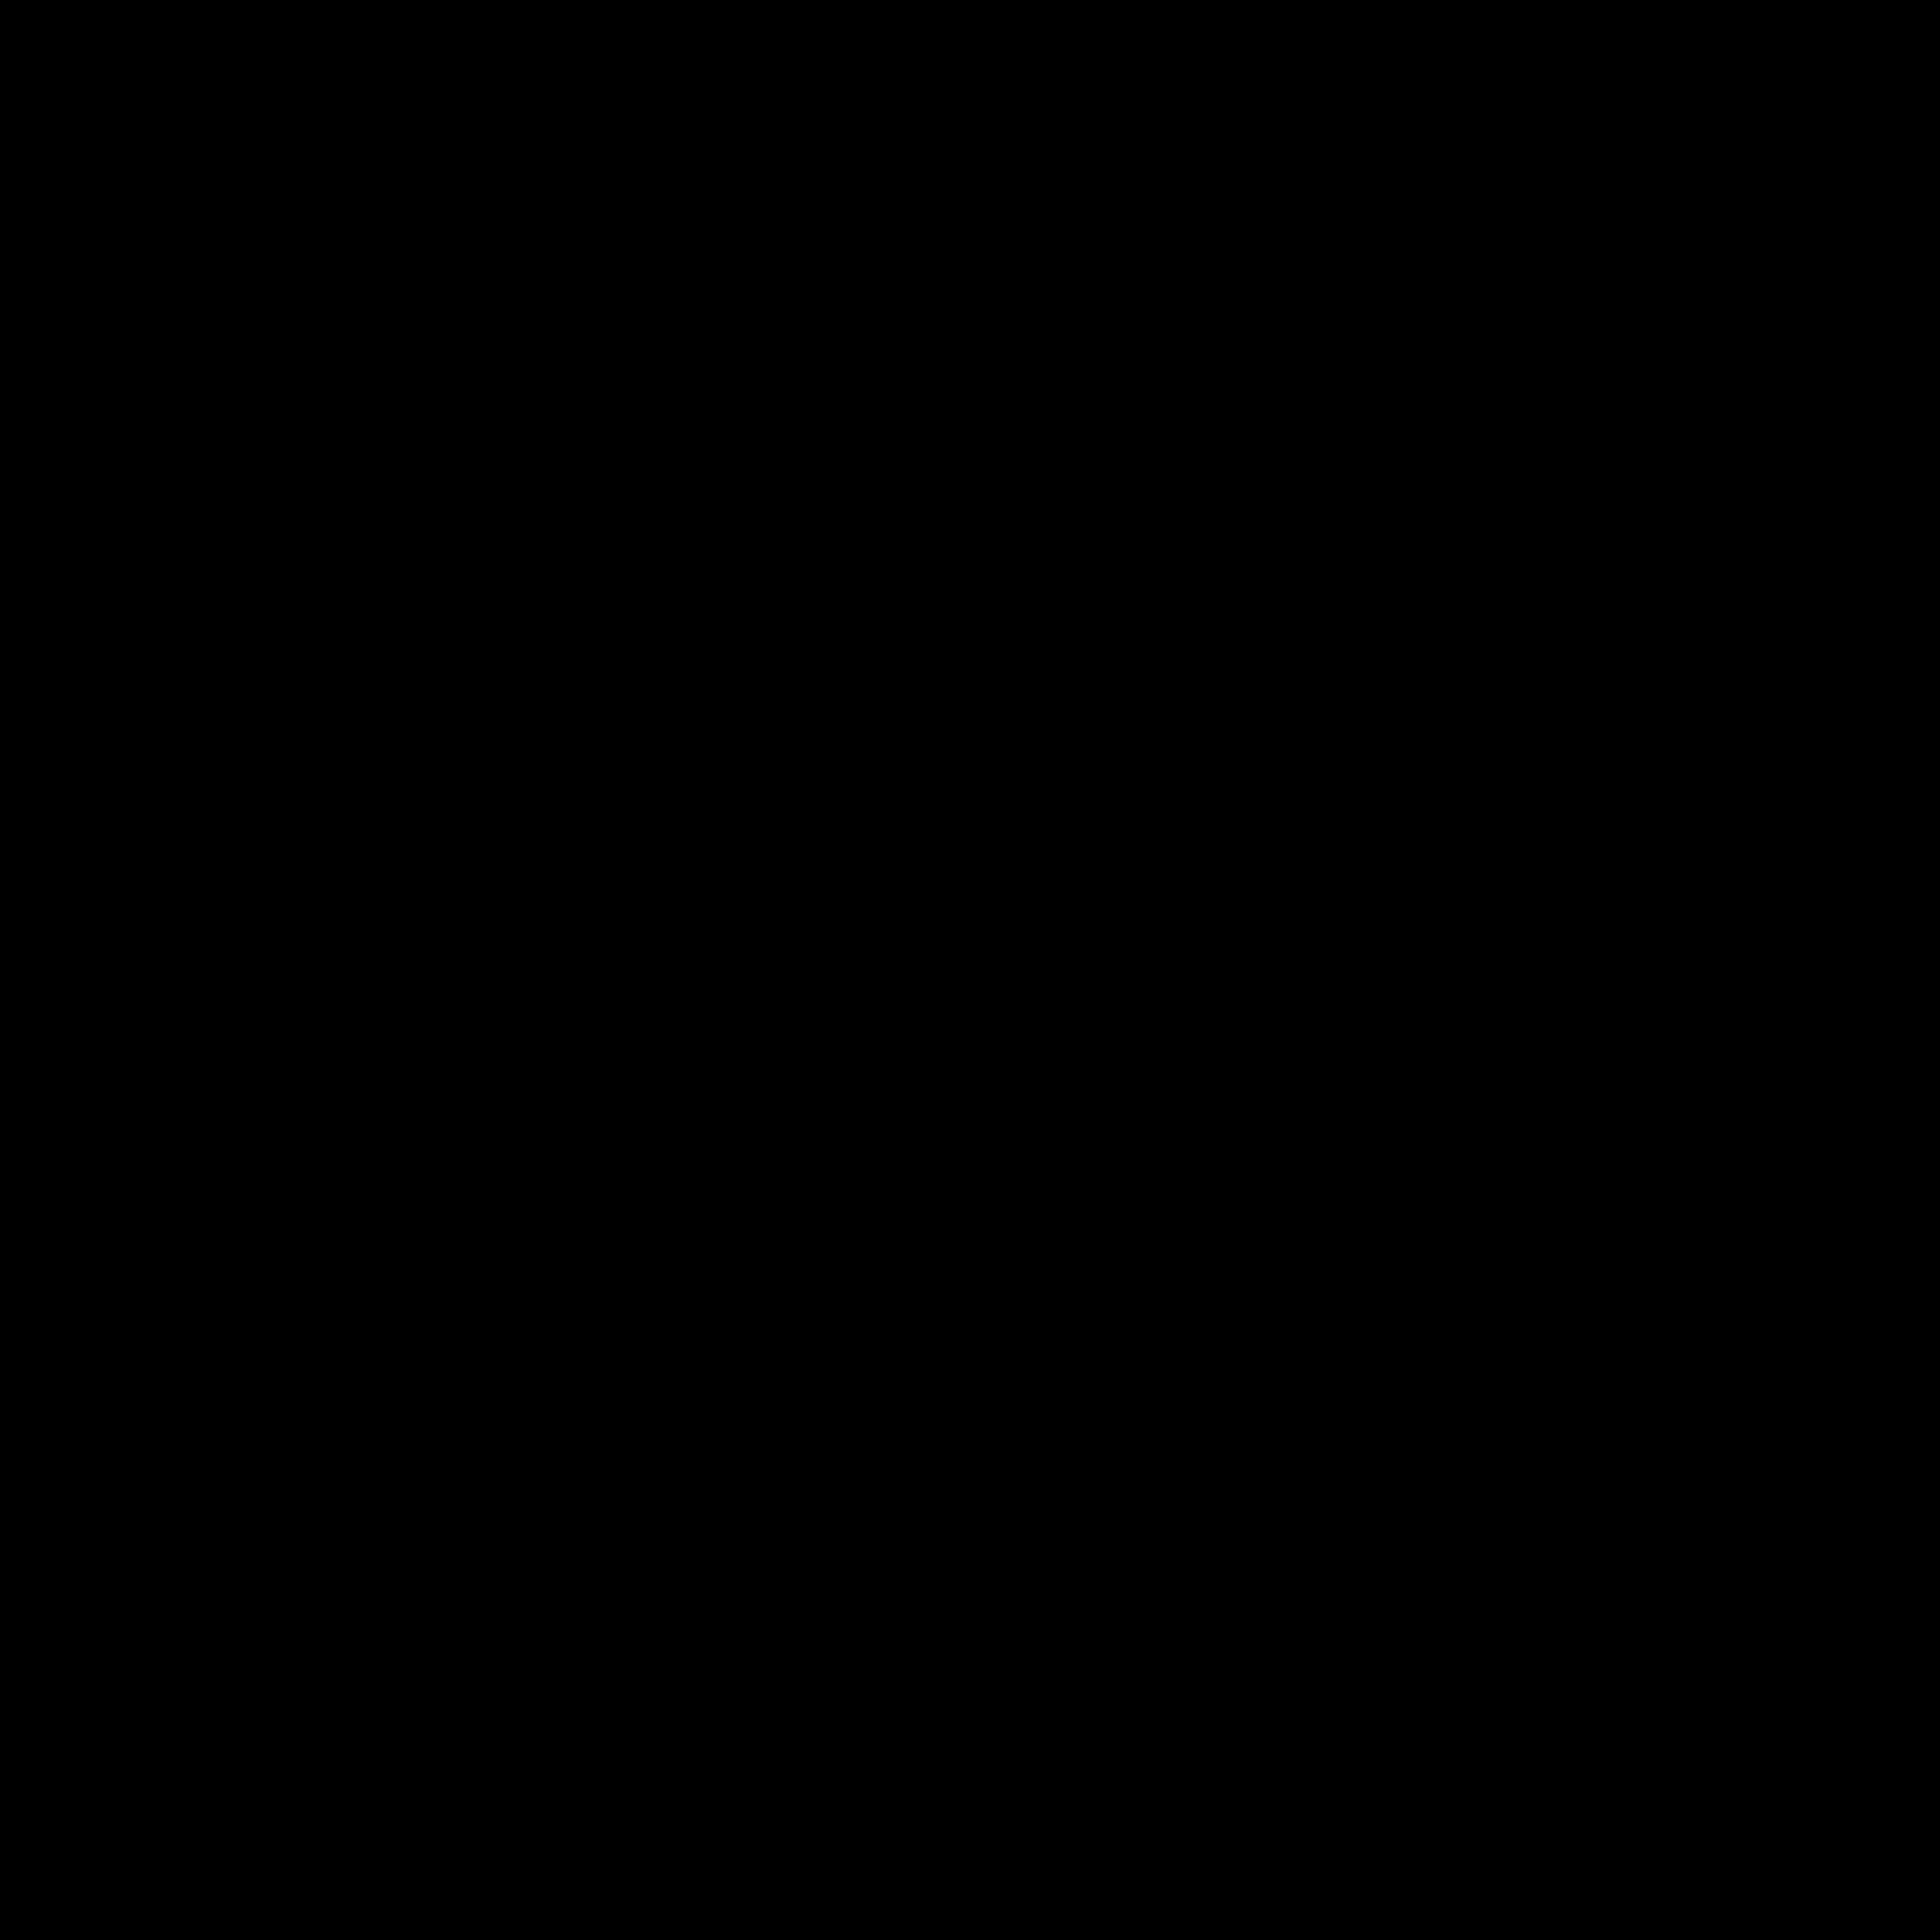 Gear Logo Vector PNG - 112638